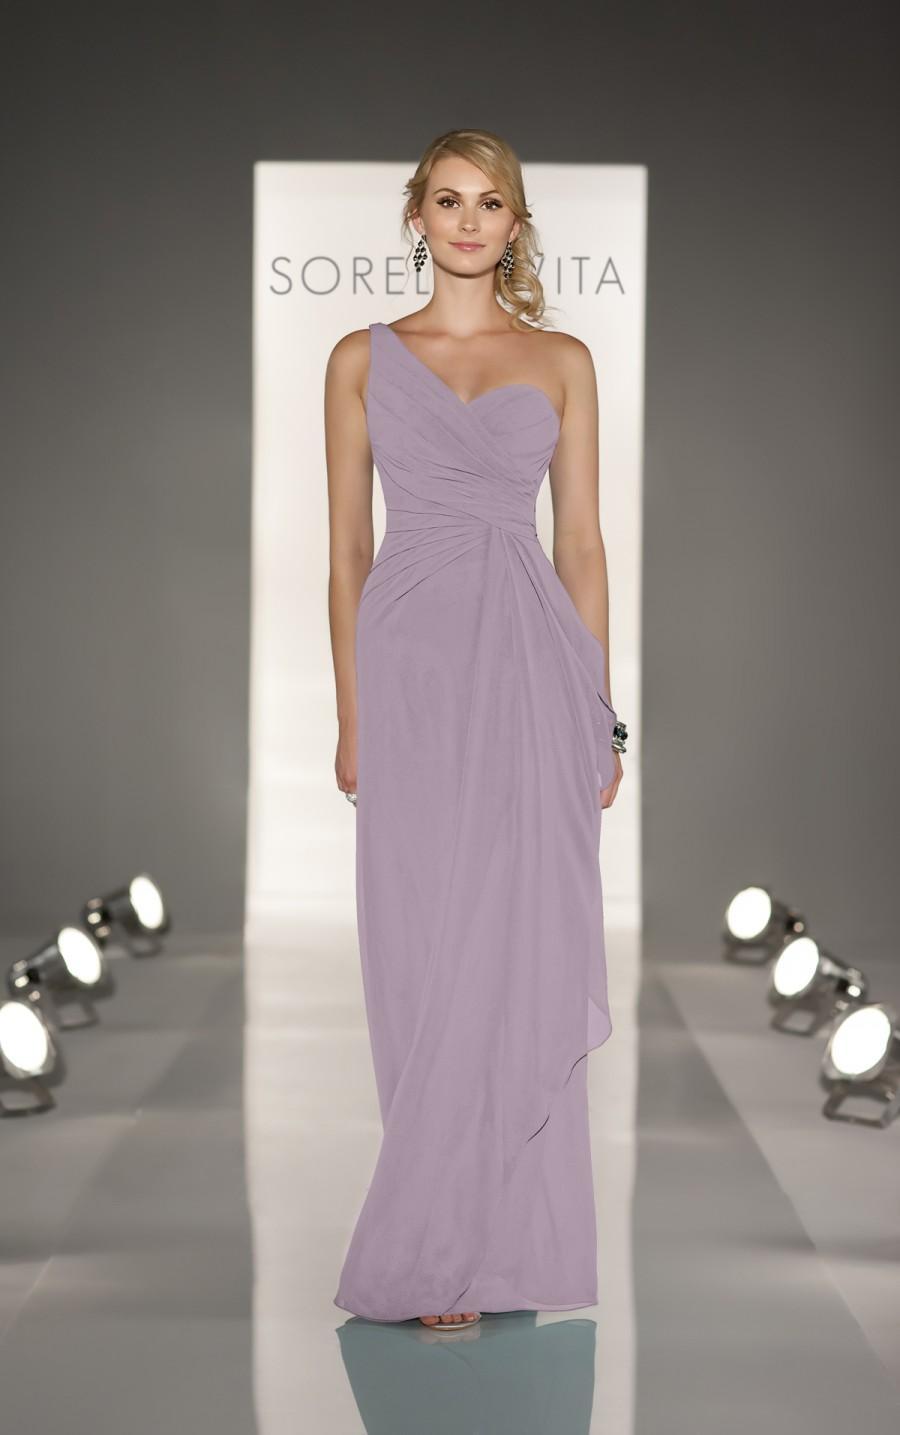 Sorella vita romantic bridesmaid dress style 8201 2447744 weddbook sorella vita romantic bridesmaid dress style 8201 ombrellifo Images